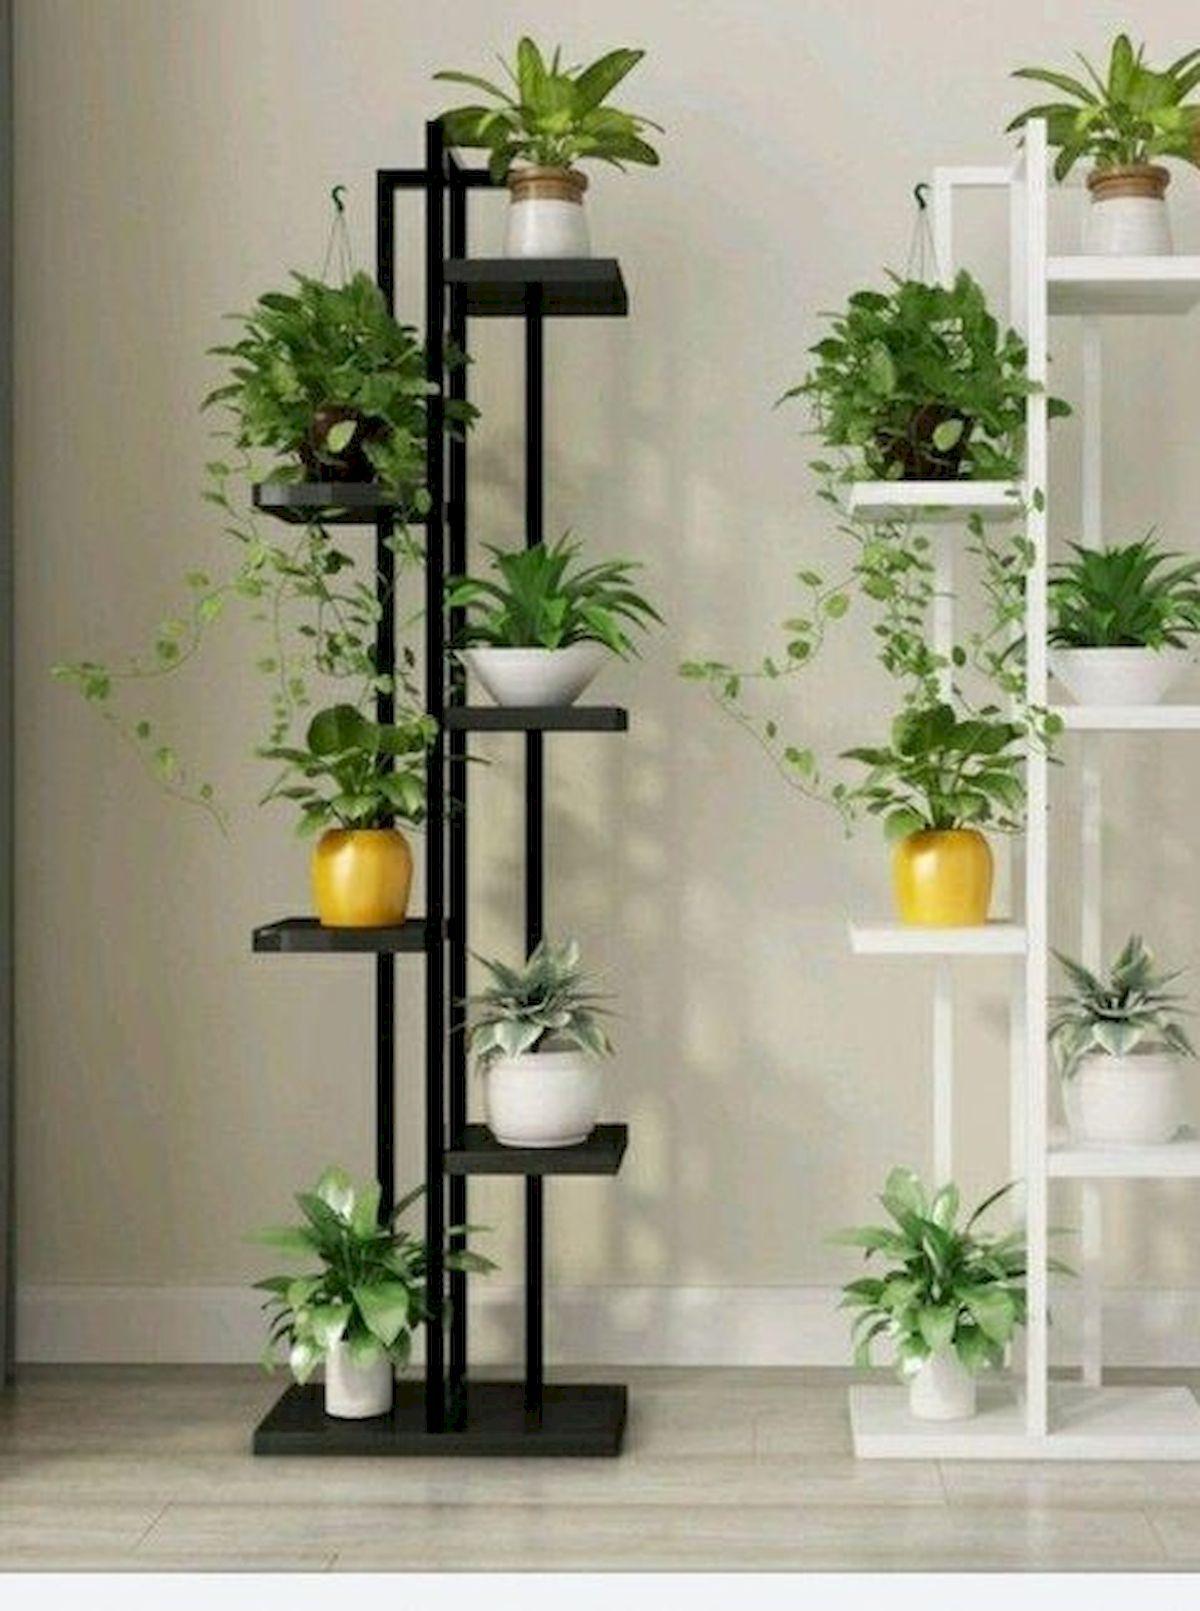 50 Inspiring Herb Garden Design Ideas And Remodel House Plants Decor Plant Decor Vertical Garden Design